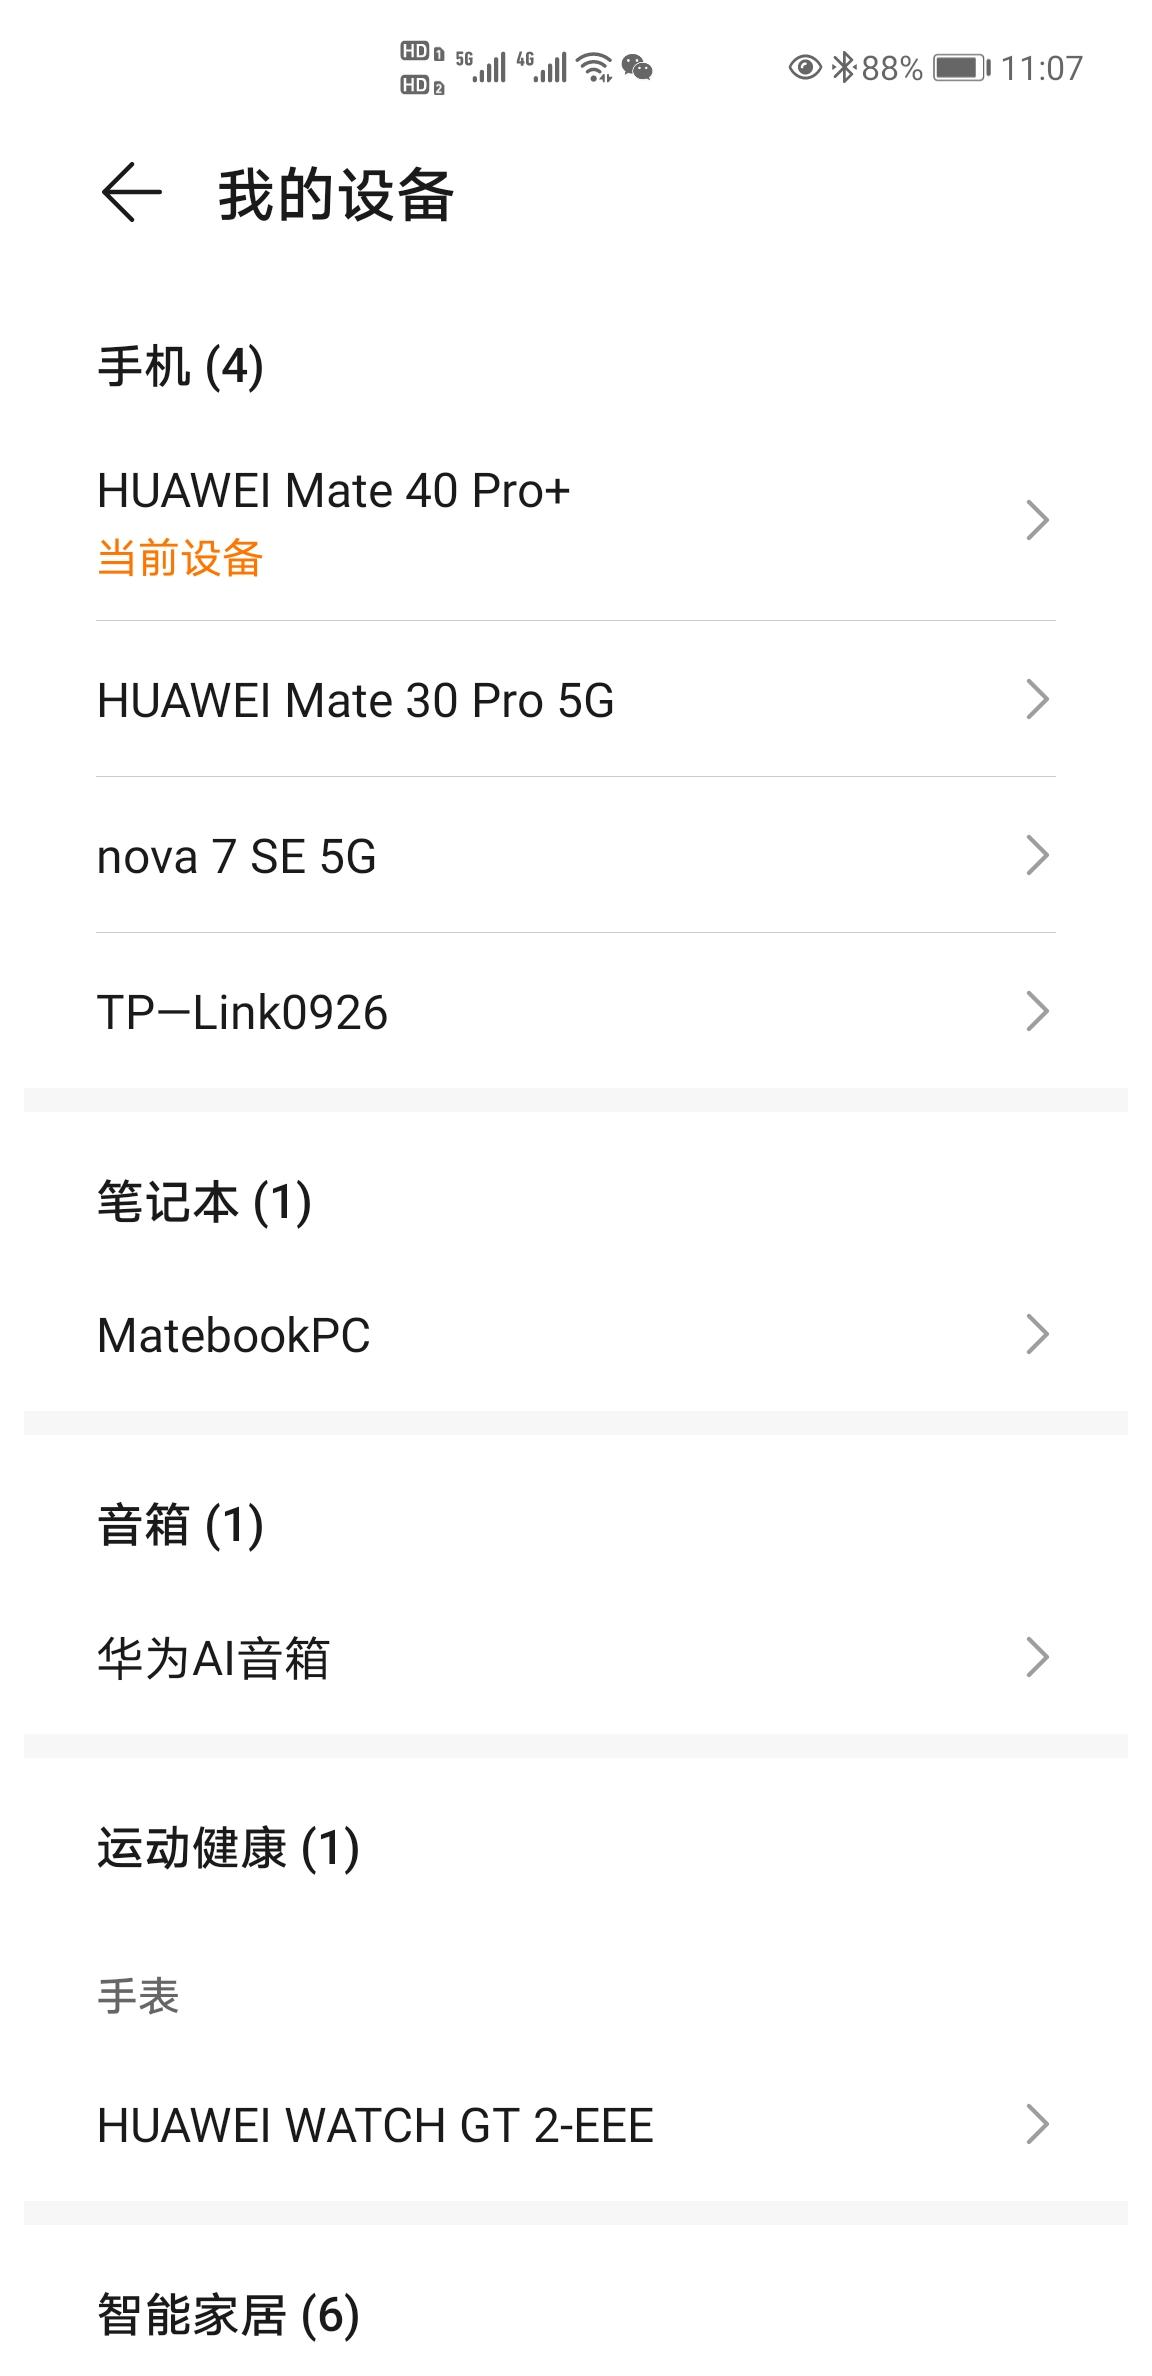 Screenshot_20201122_110717_com.huawei.hwid.jpg